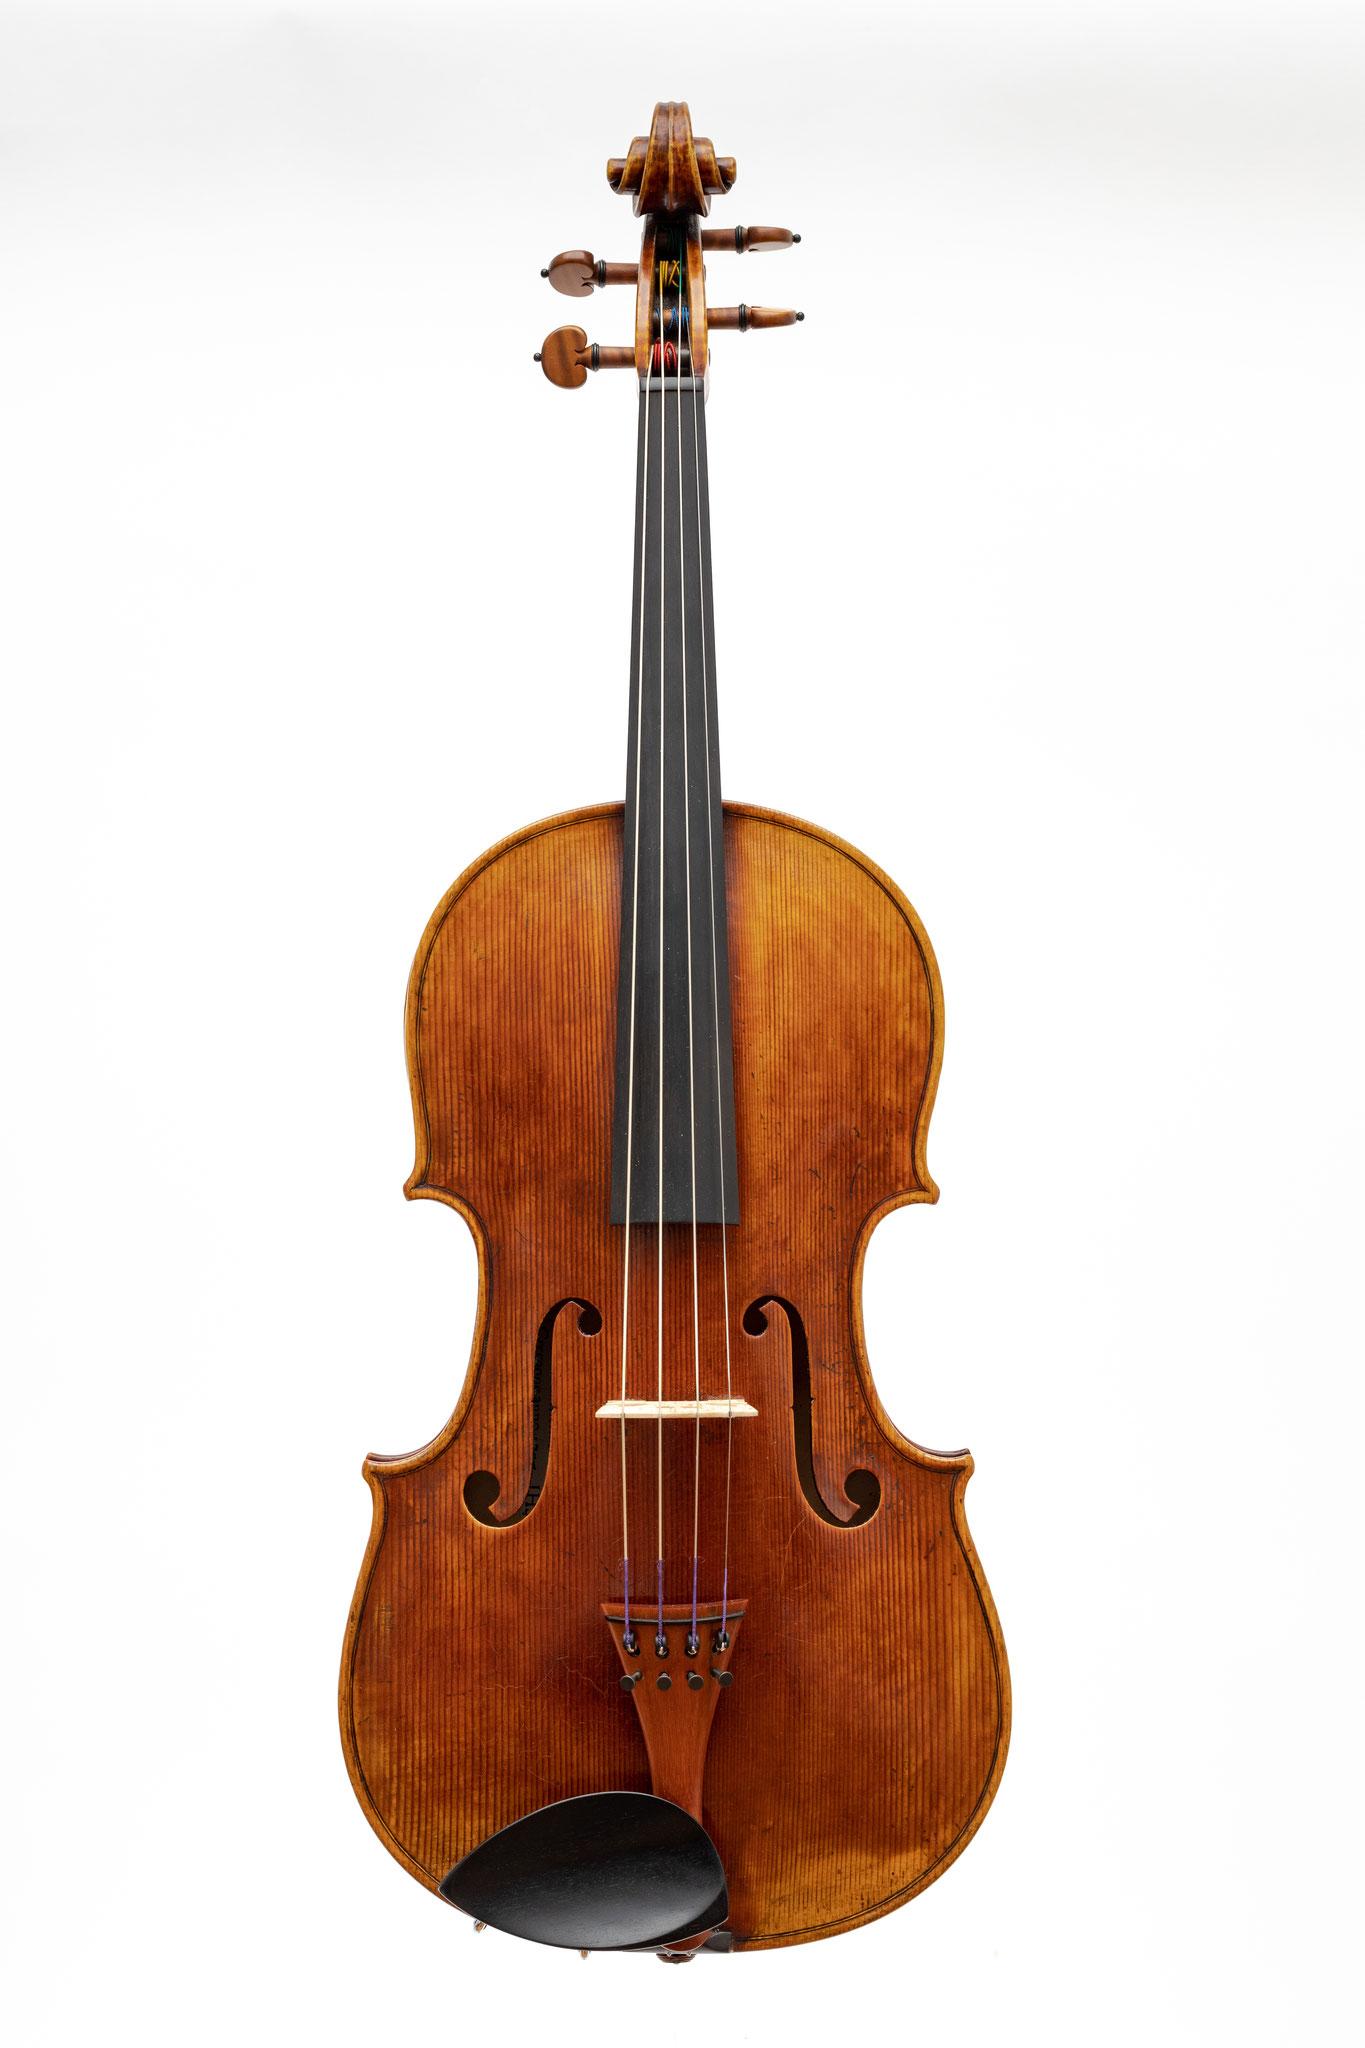 Viola im Stil von G.Guarneri del Gesù (2019/CH), Photo: VDB Photography